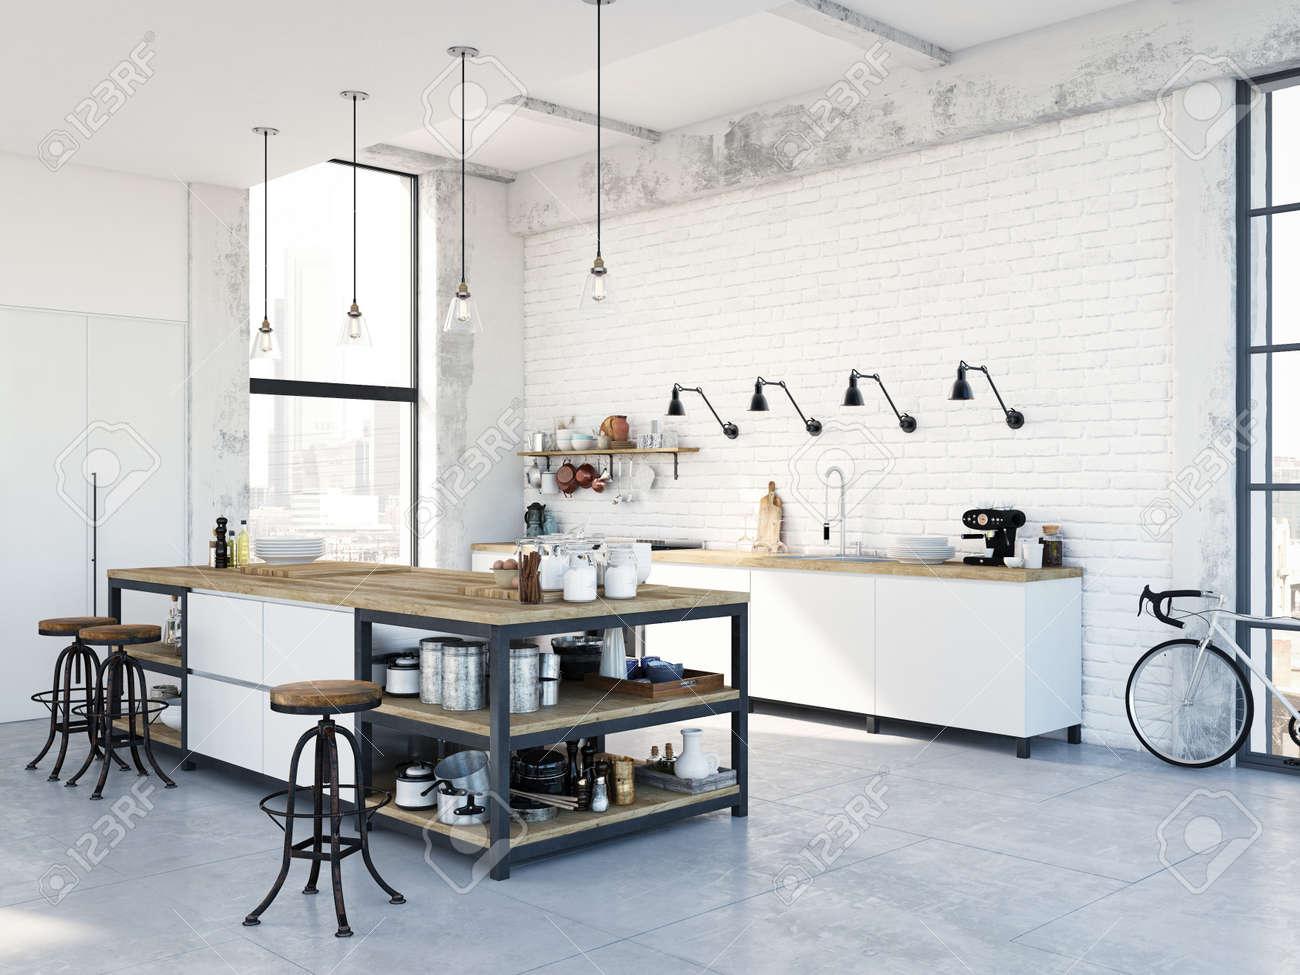 modern nordic kitchen in loft apartment. 3D rendering - 79134047